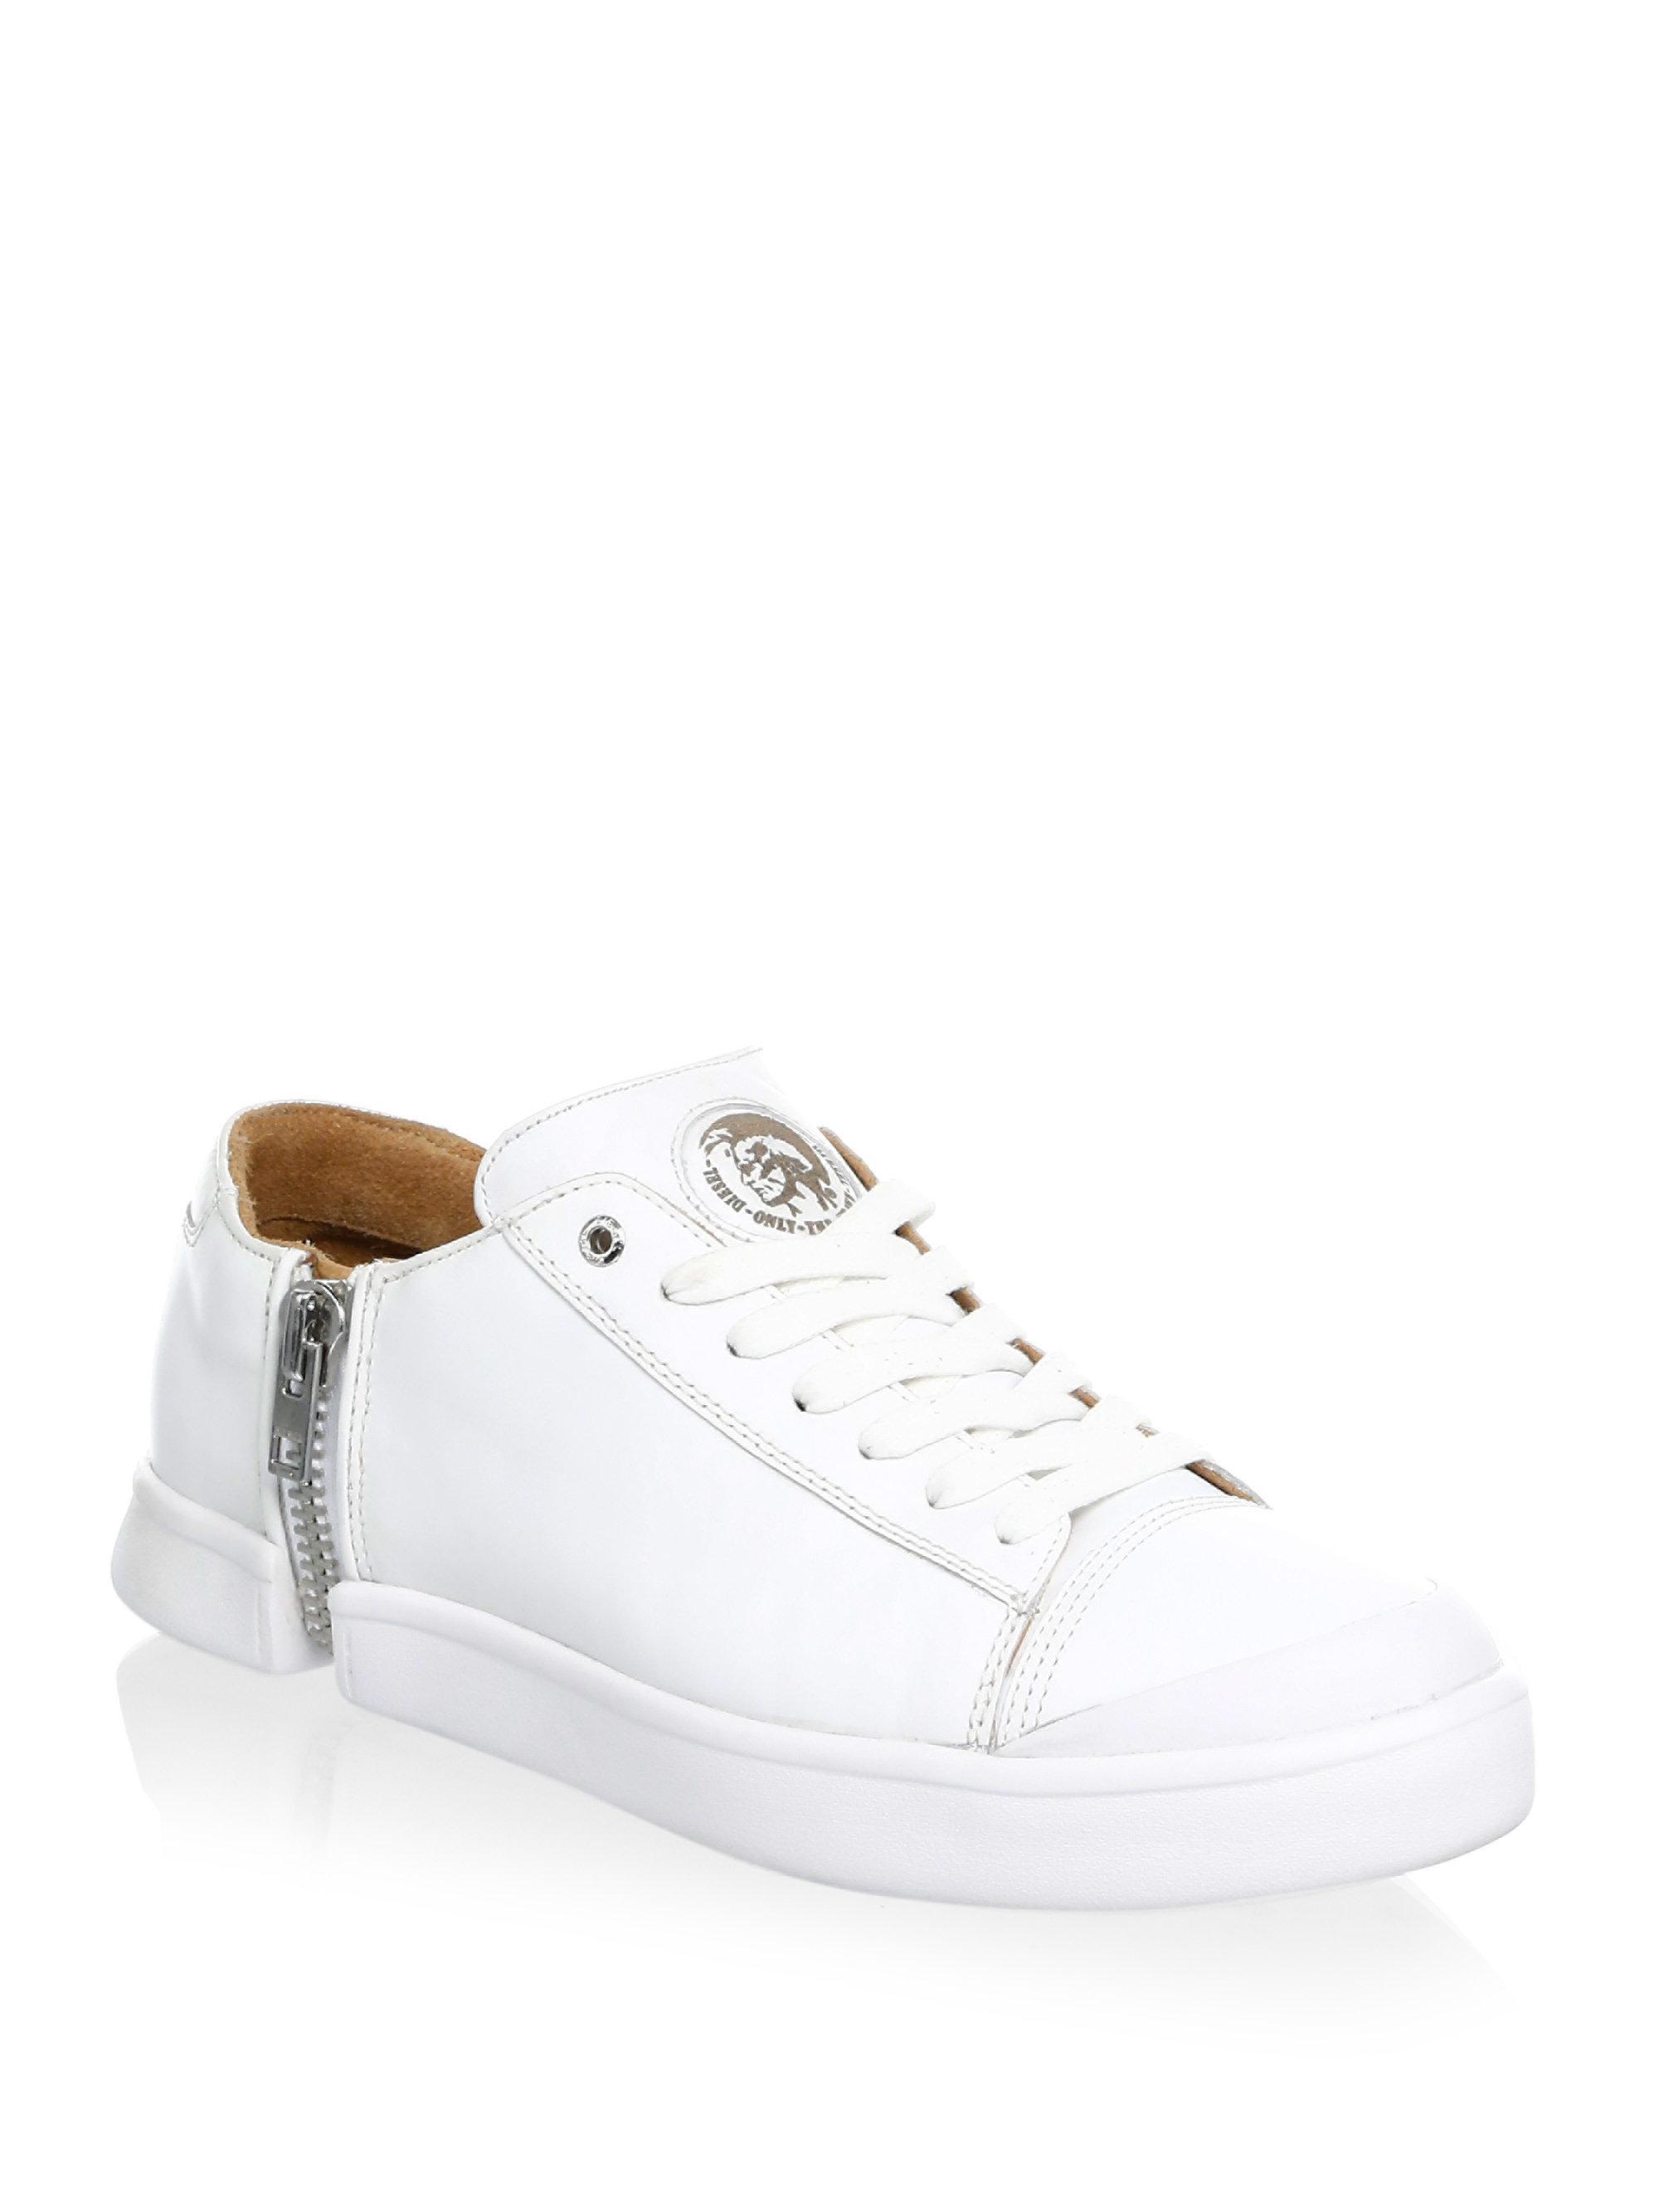 S-Nentish Low sneakers - White Diesel GVMuLp